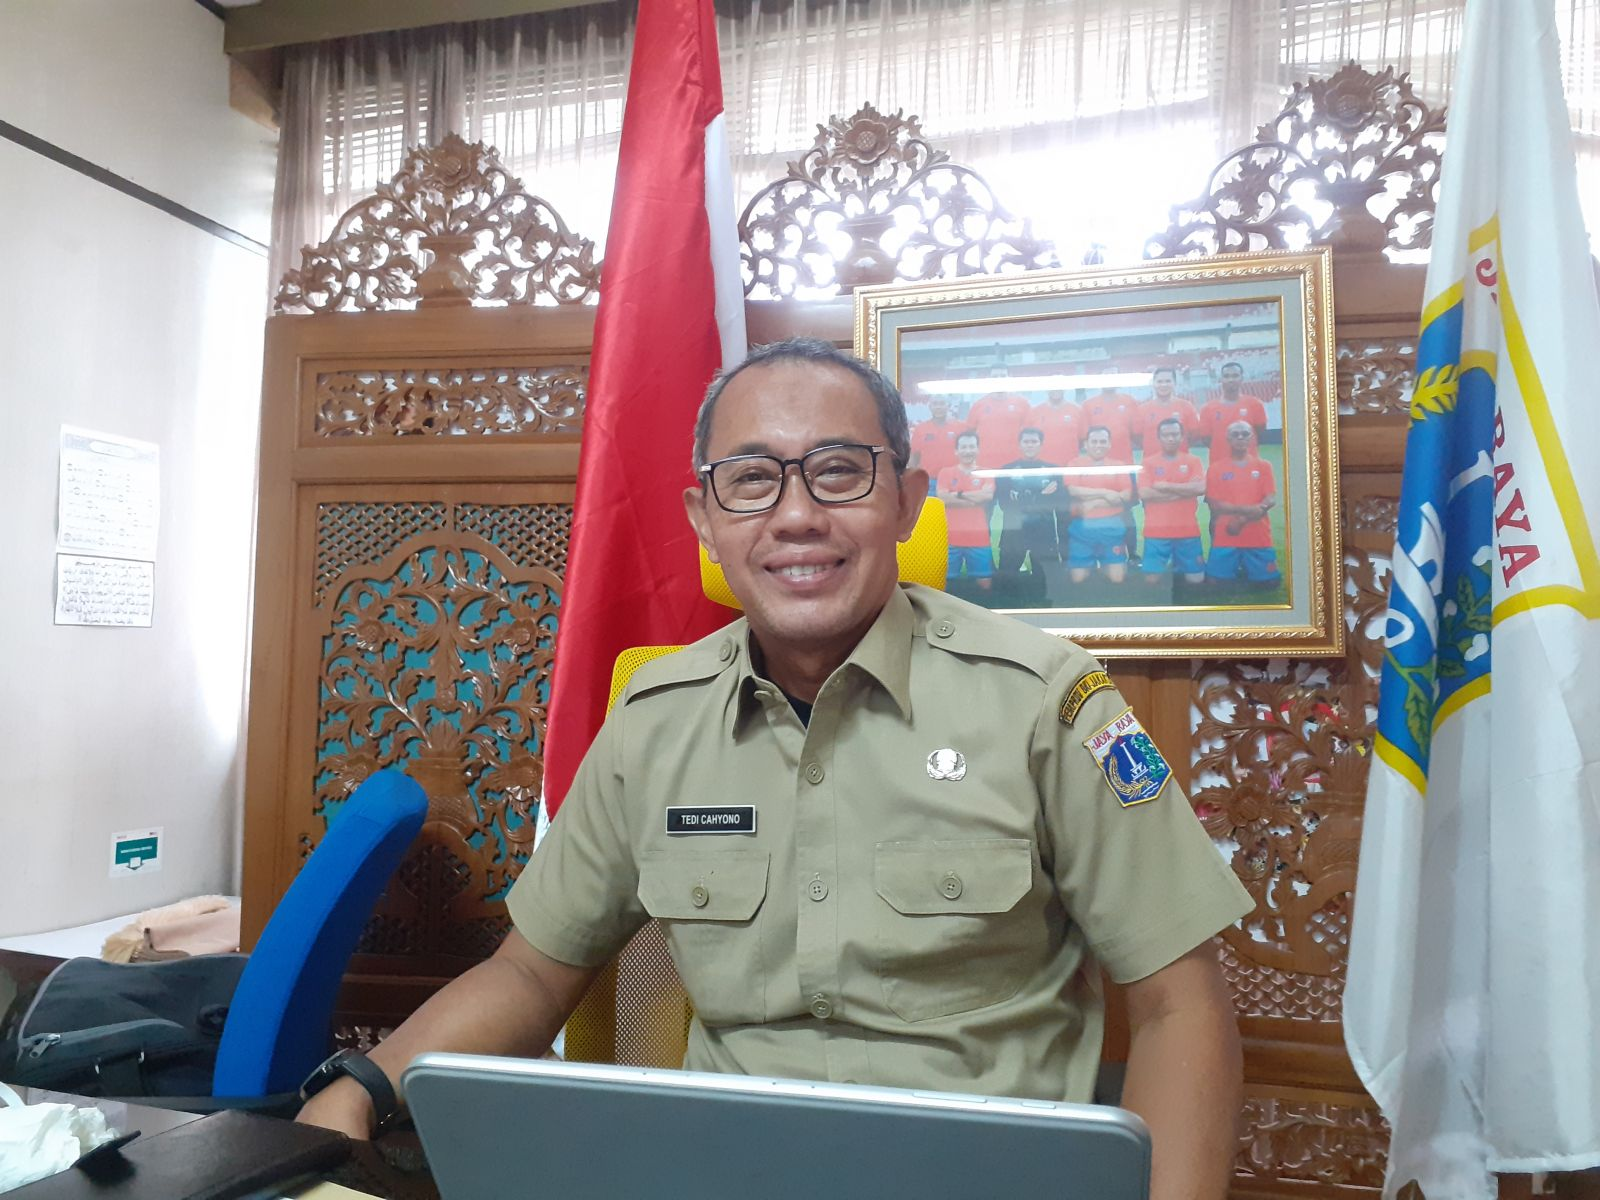 Kepala Suku Dinas Pemuda dan Olahraga Jakarta Pusat, Dr. Tedy Cahyono, M.Pd. Foto: Andri Bagus/GenPI.co